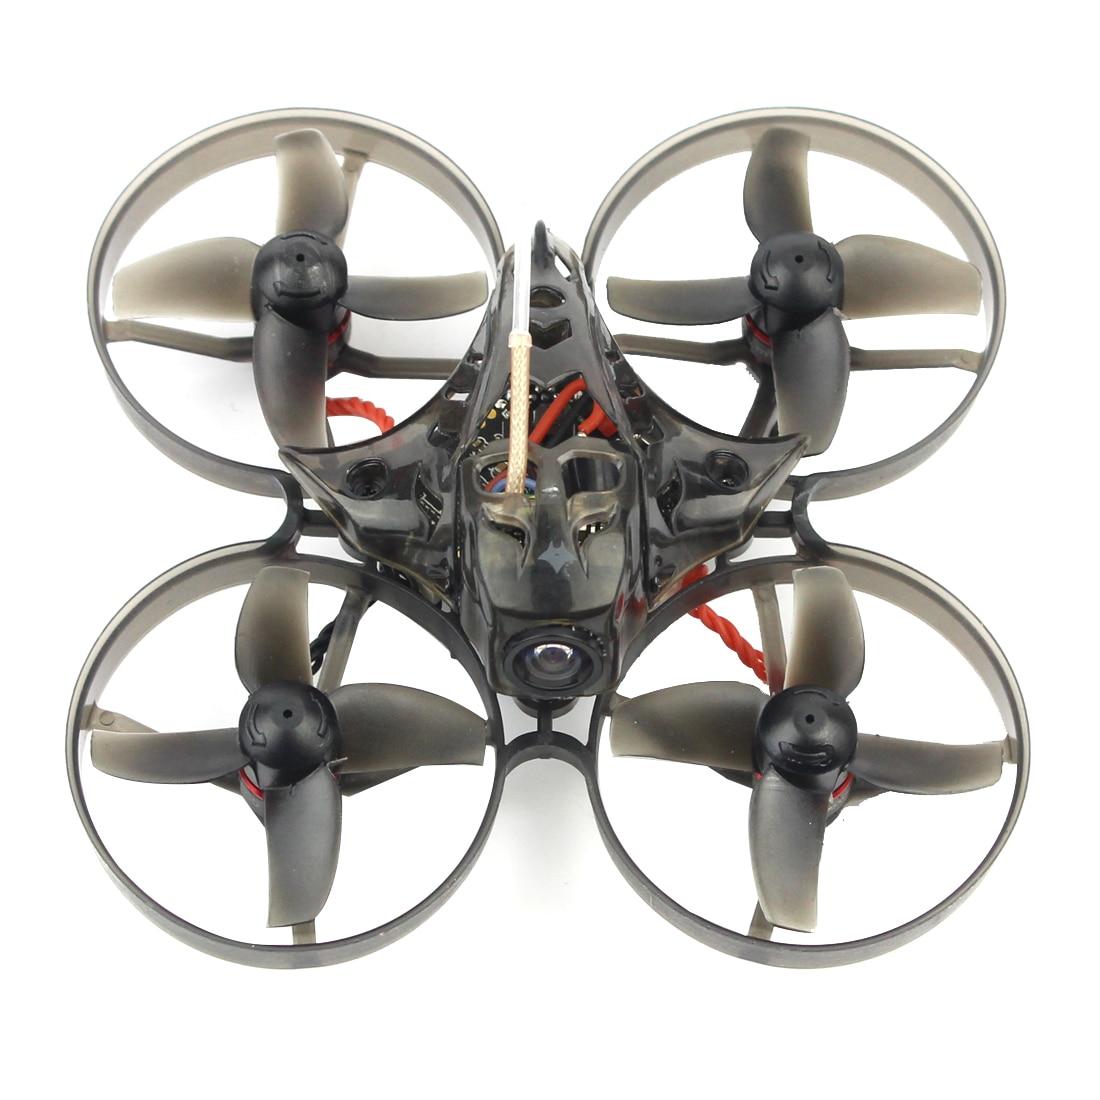 Mini Mobula7 75mm Crazybee F3 Pro OSD 2 S RC FPV Racing Drone Quadcopter w/Mise À Niveau BB2 ESC 700TVL BNF Compatible Frsky Flysky